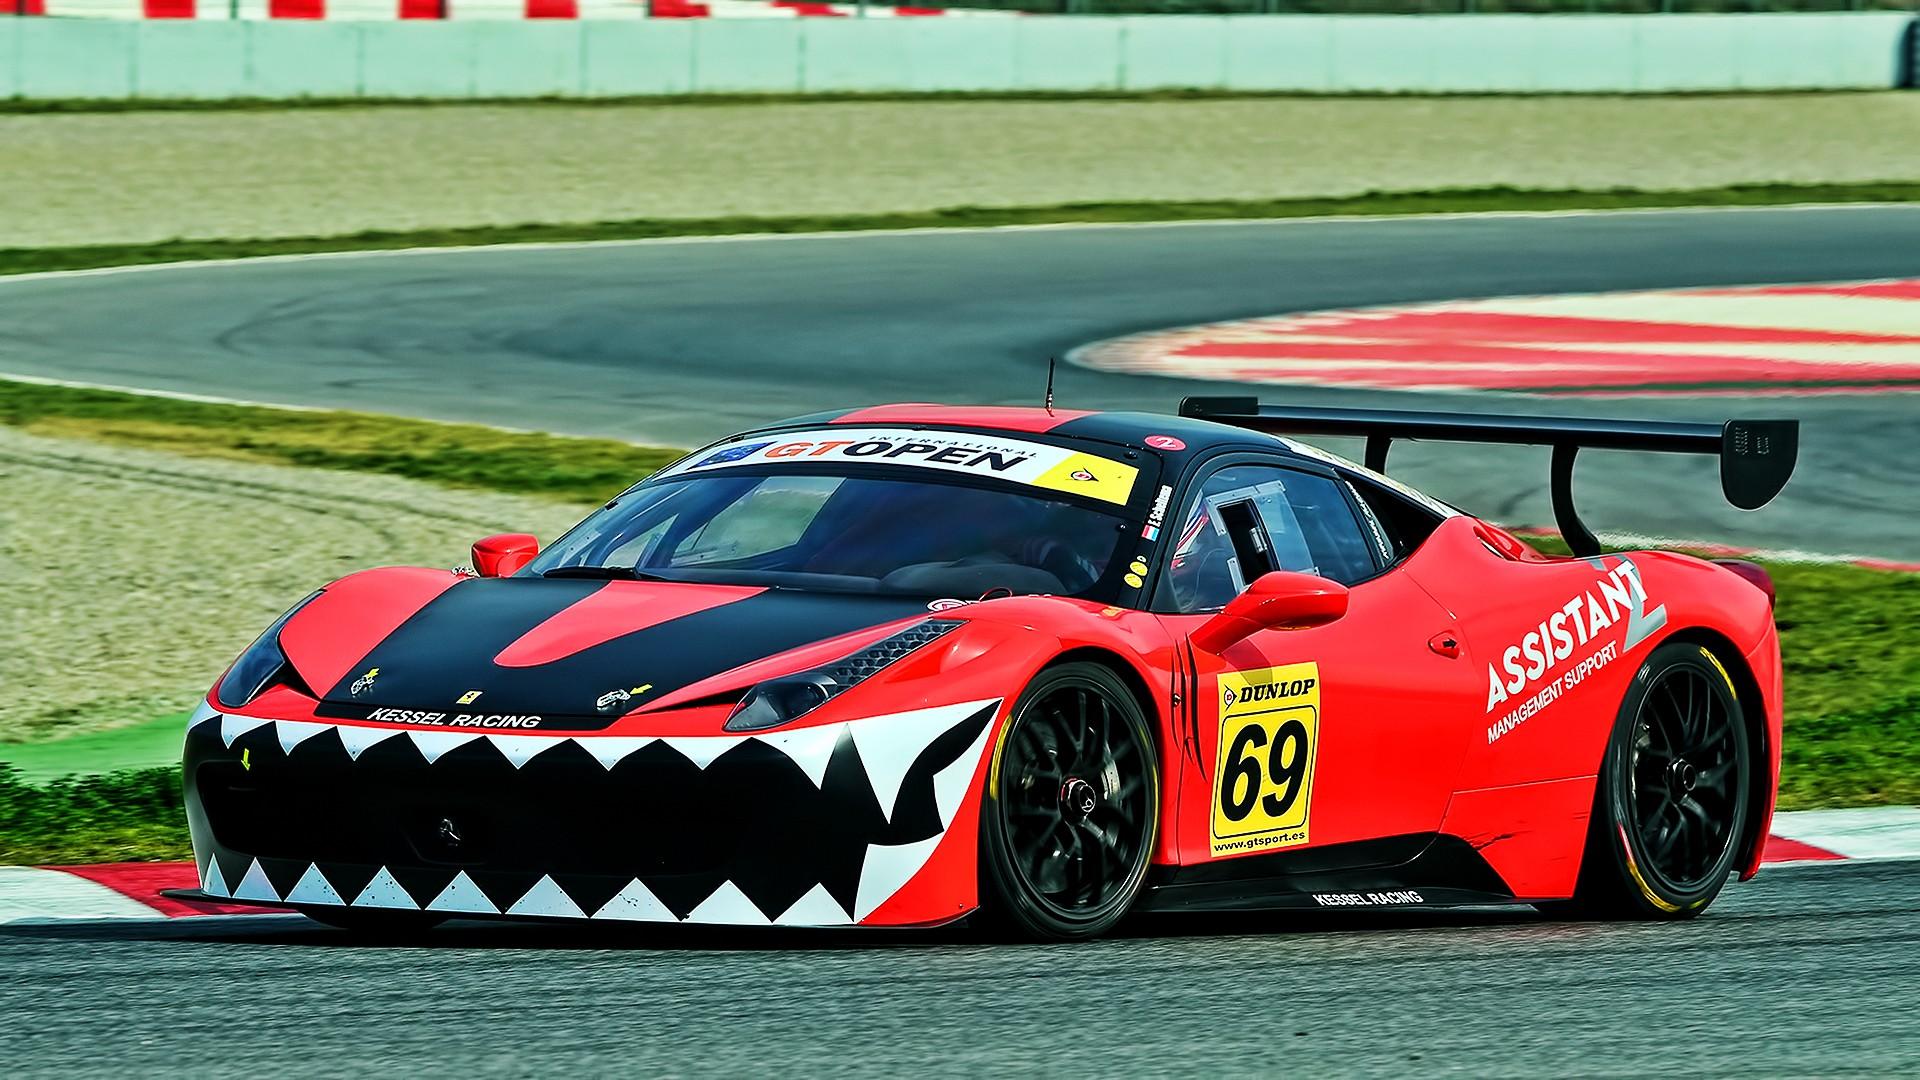 Wallpaper : 1920x1080 px, car, Ferrari 458 Italia GT3, Ferrari ...